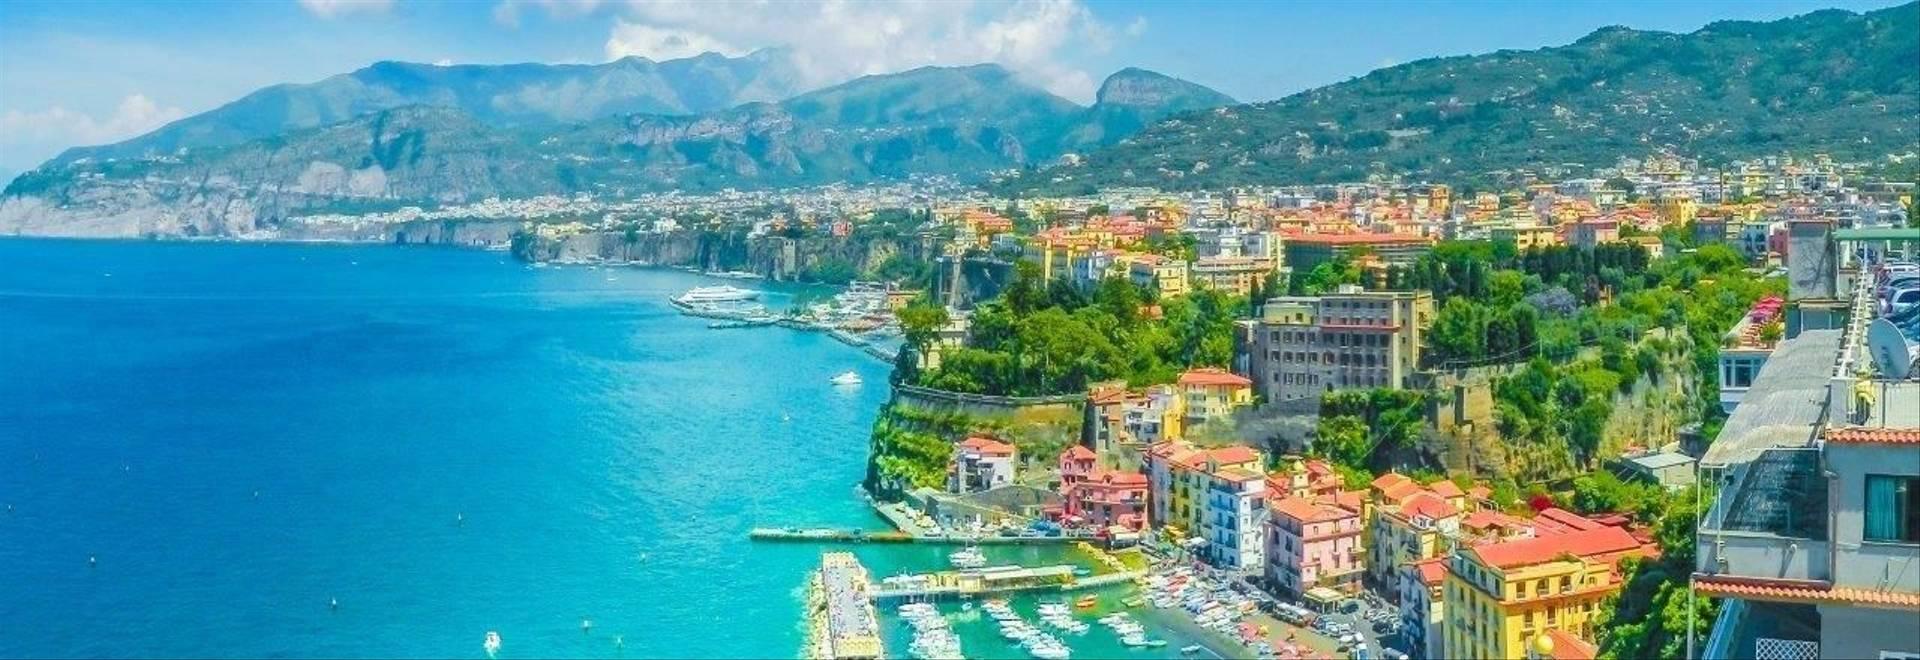 Aerial view of Sorrento, Campania, Italy .jpg